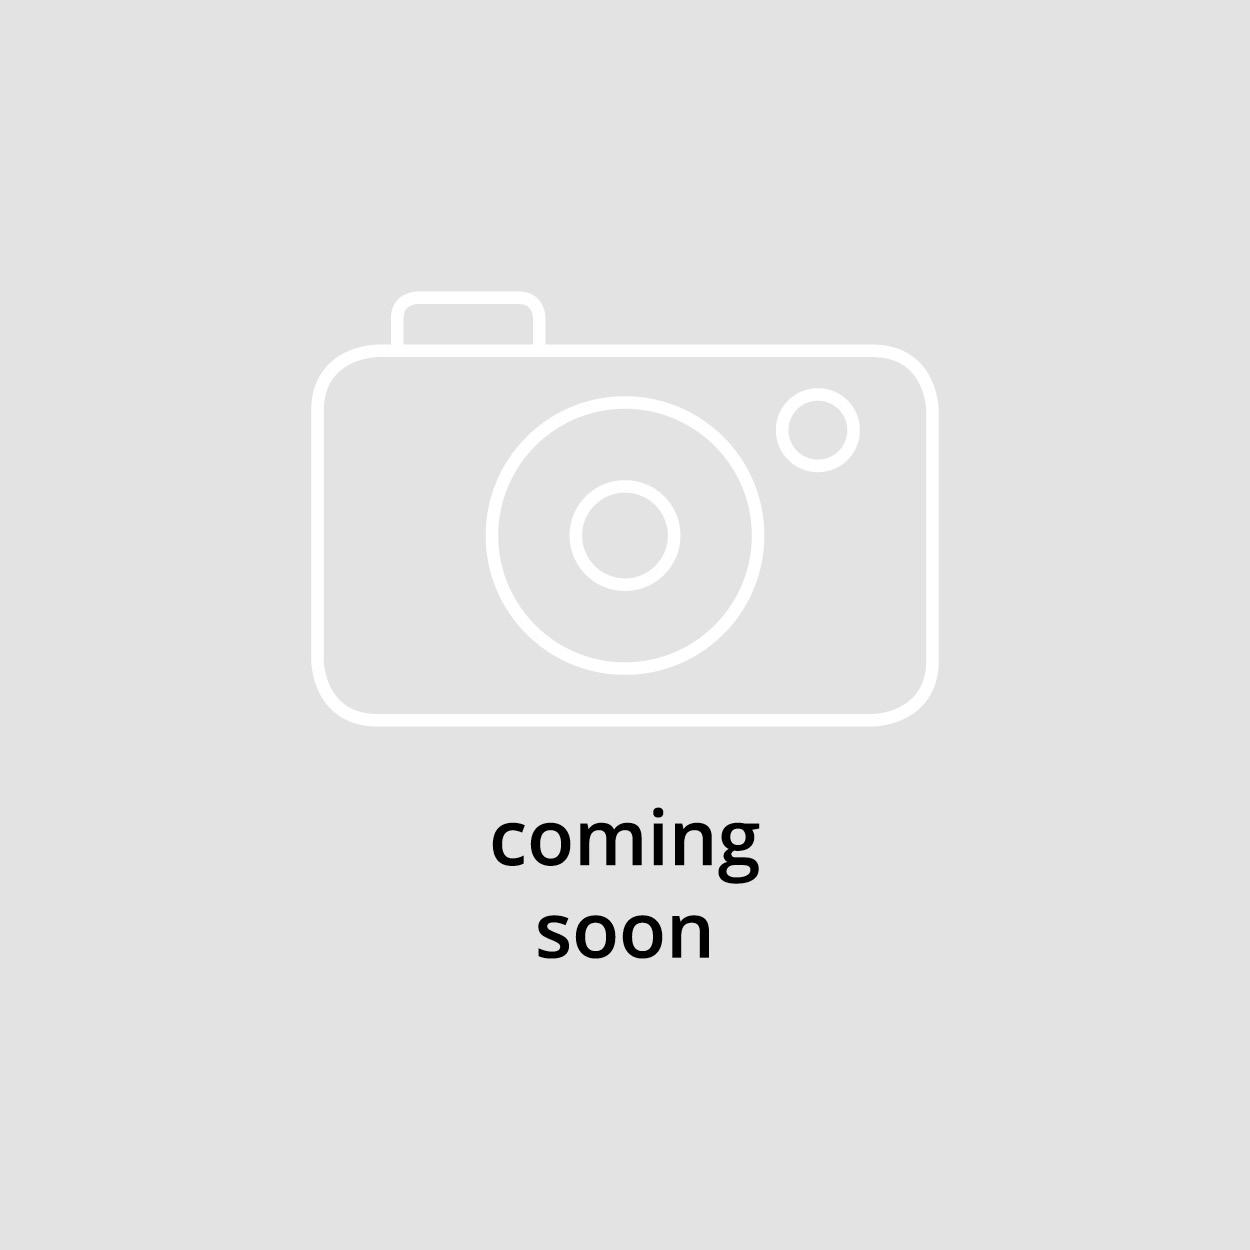 53.01.264 Mandrino  principale per Gildemeister GM16AC